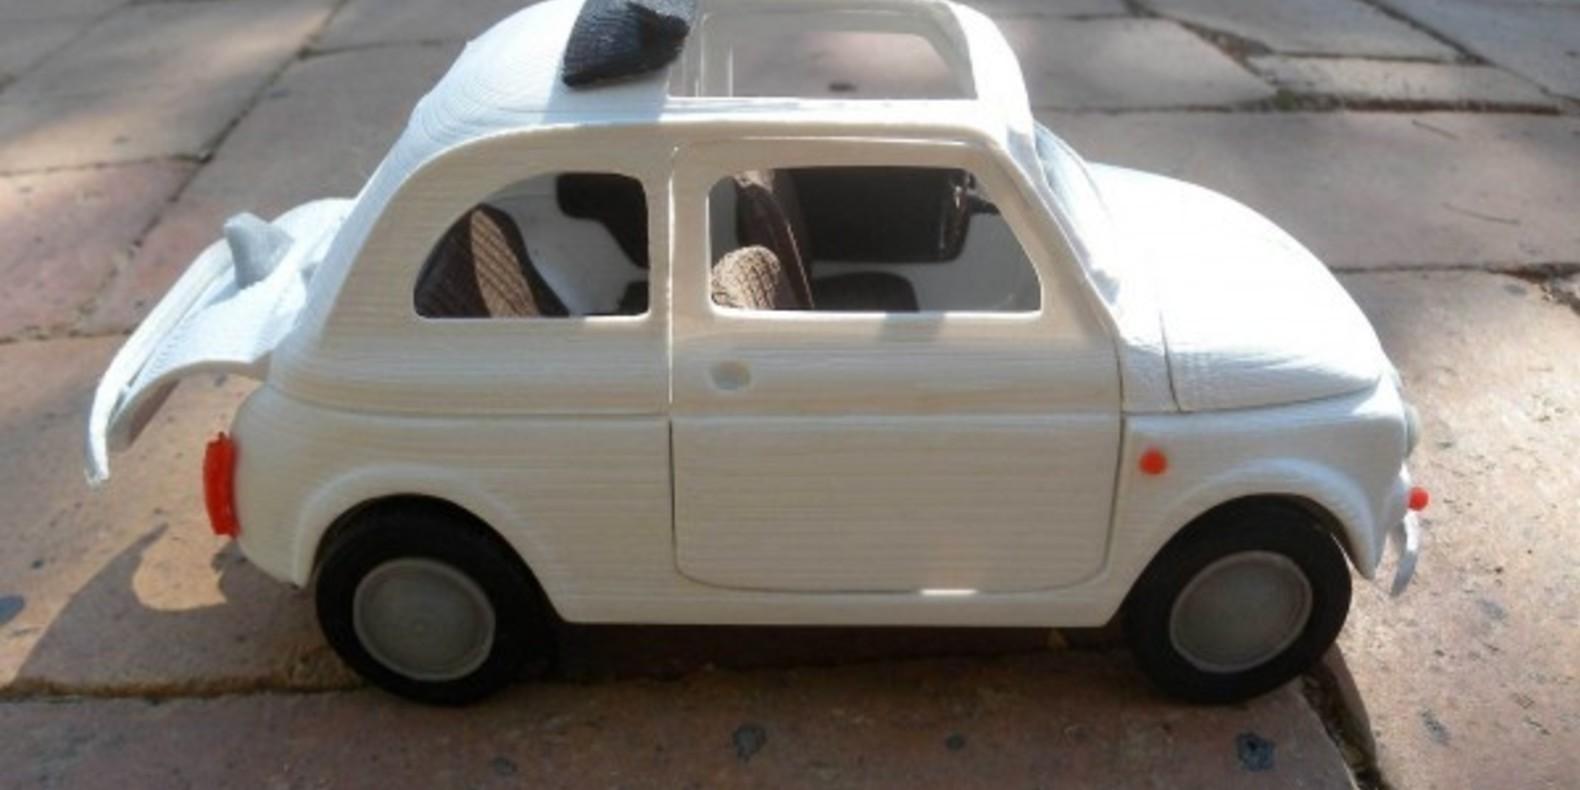 Italian Sixties Car 3 - Mao Casella - Cults modélisme 3D printing Impression 3D Fichier 3D